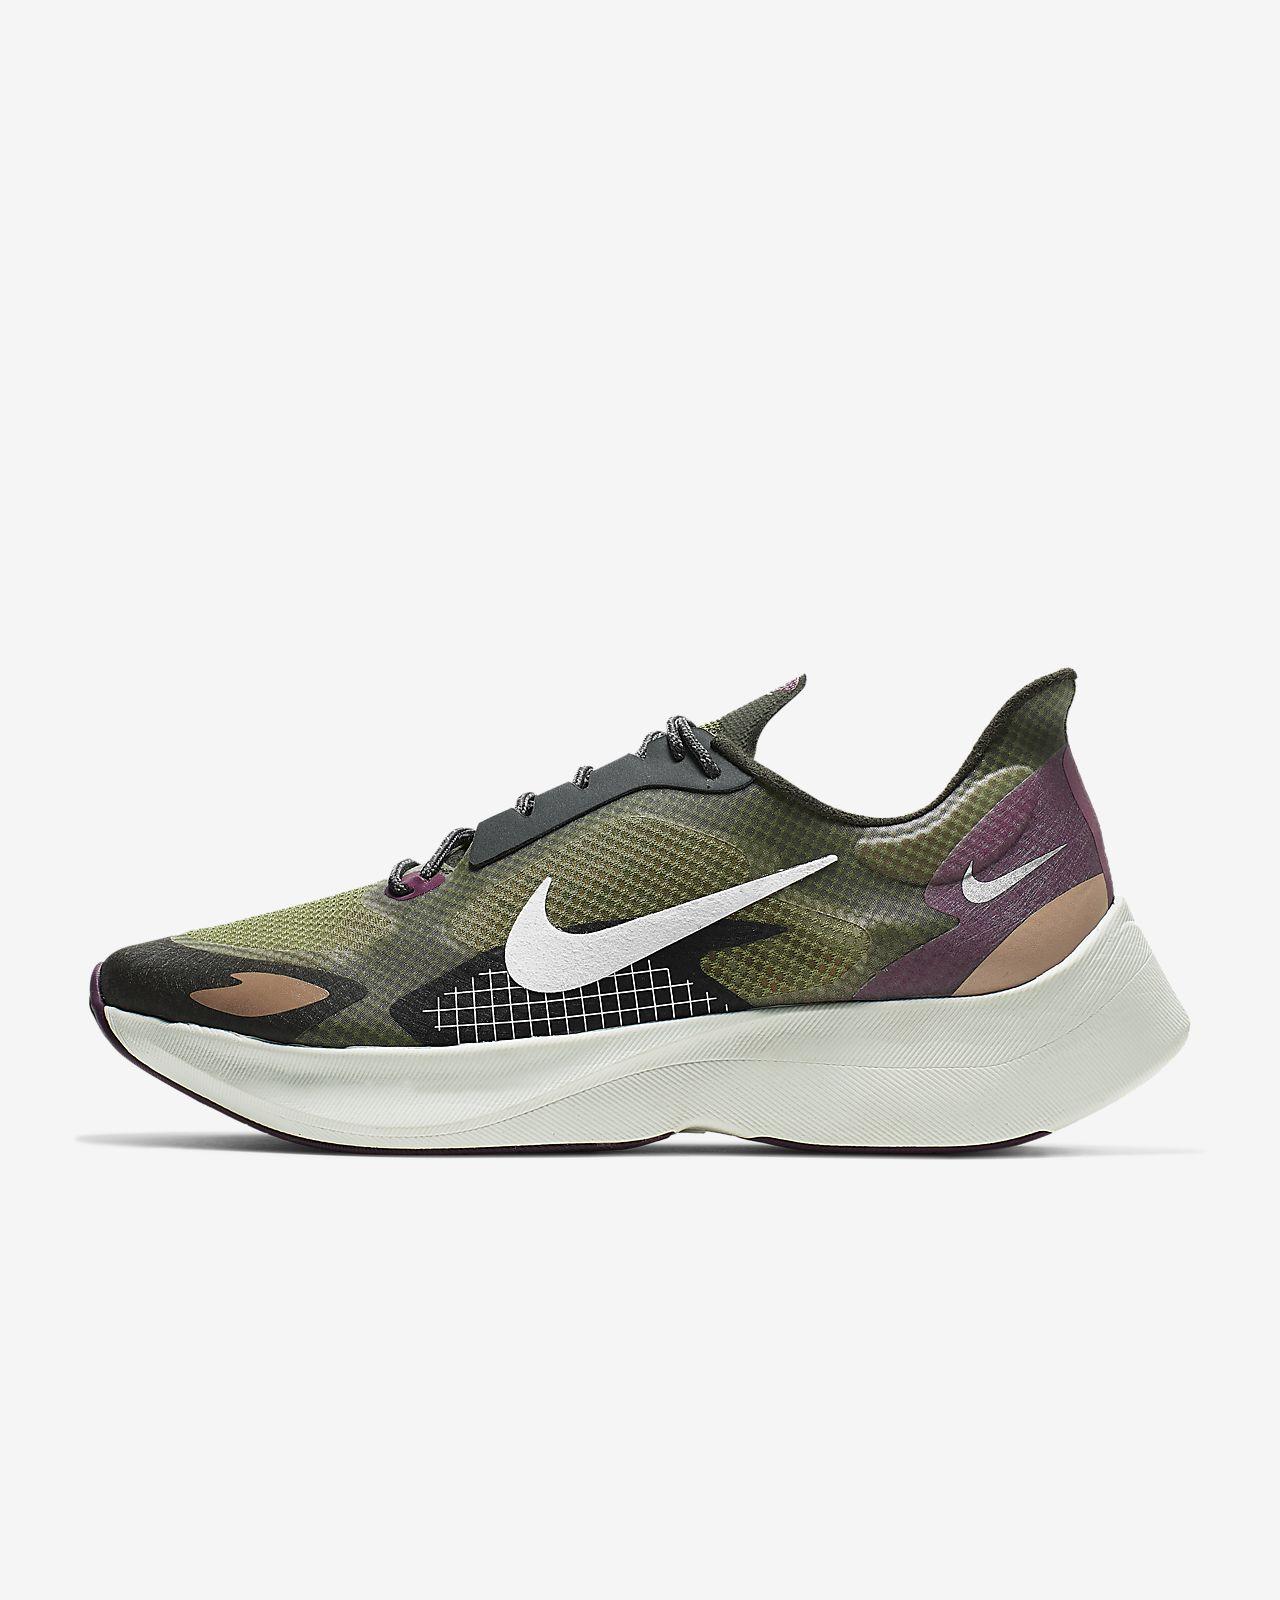 Nike Vapor Street PEG SP 男子运动鞋